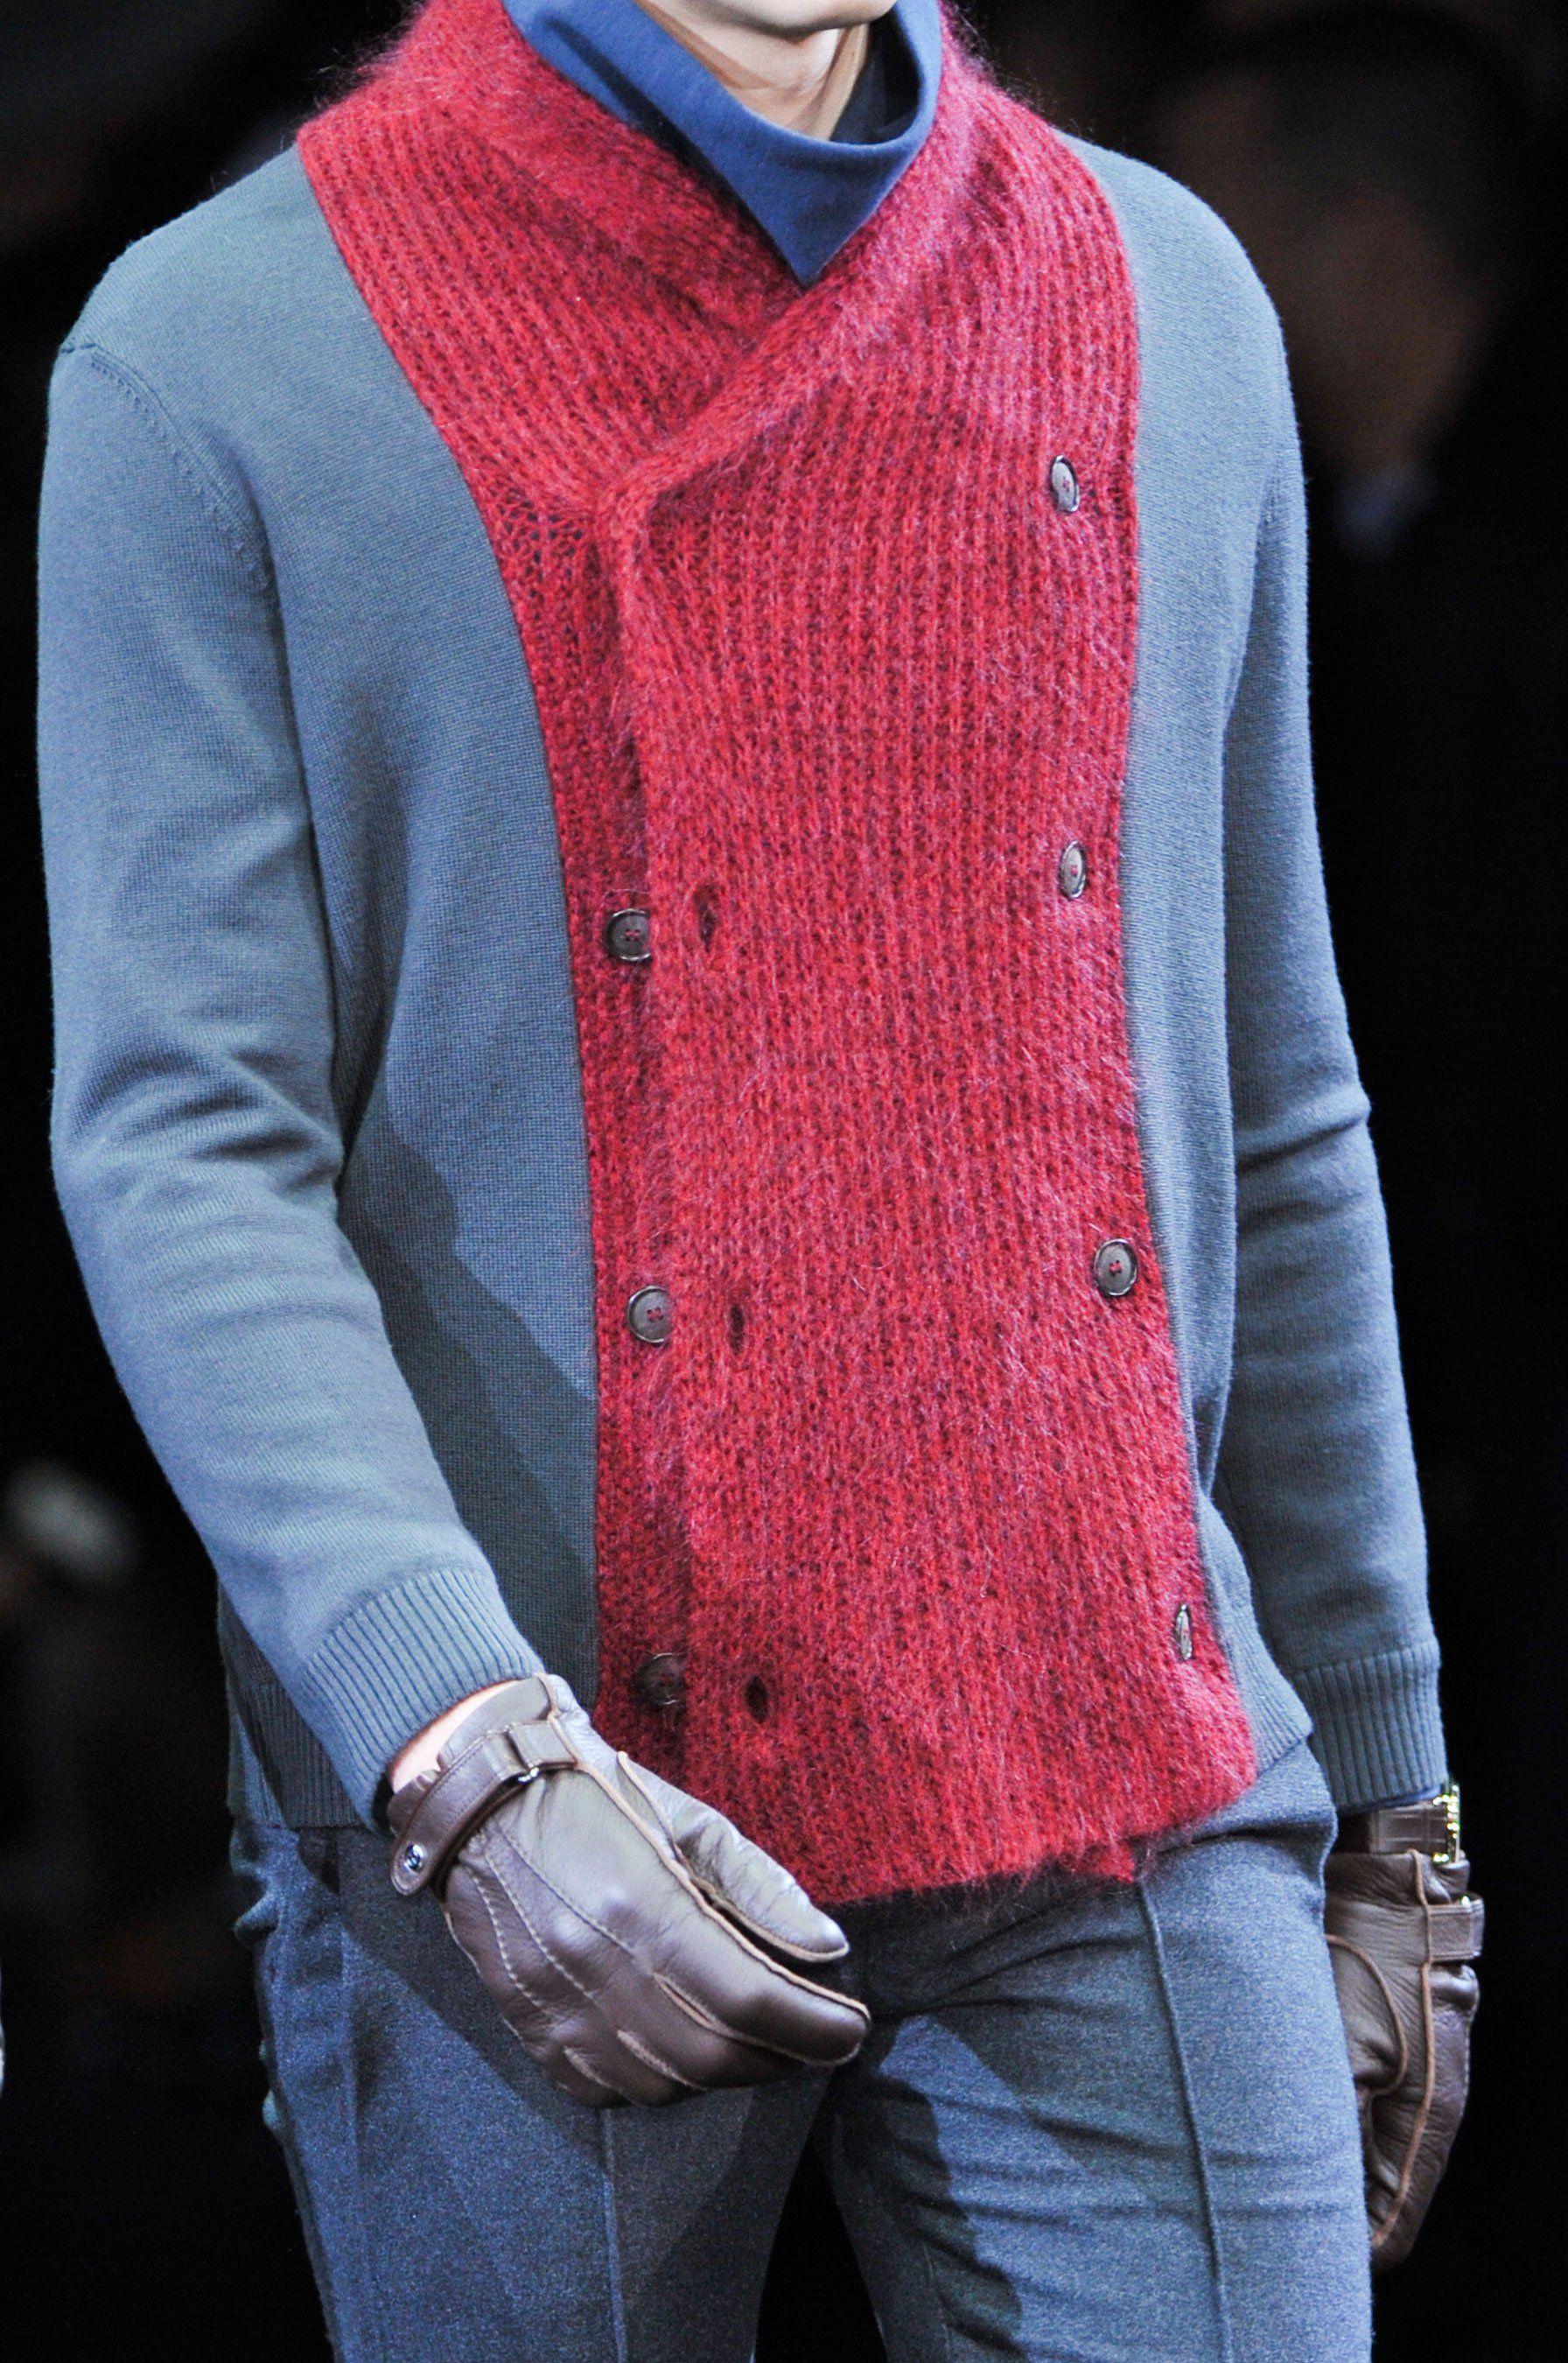 Giorgio Armani Autumn (Fall) / Winter 2014